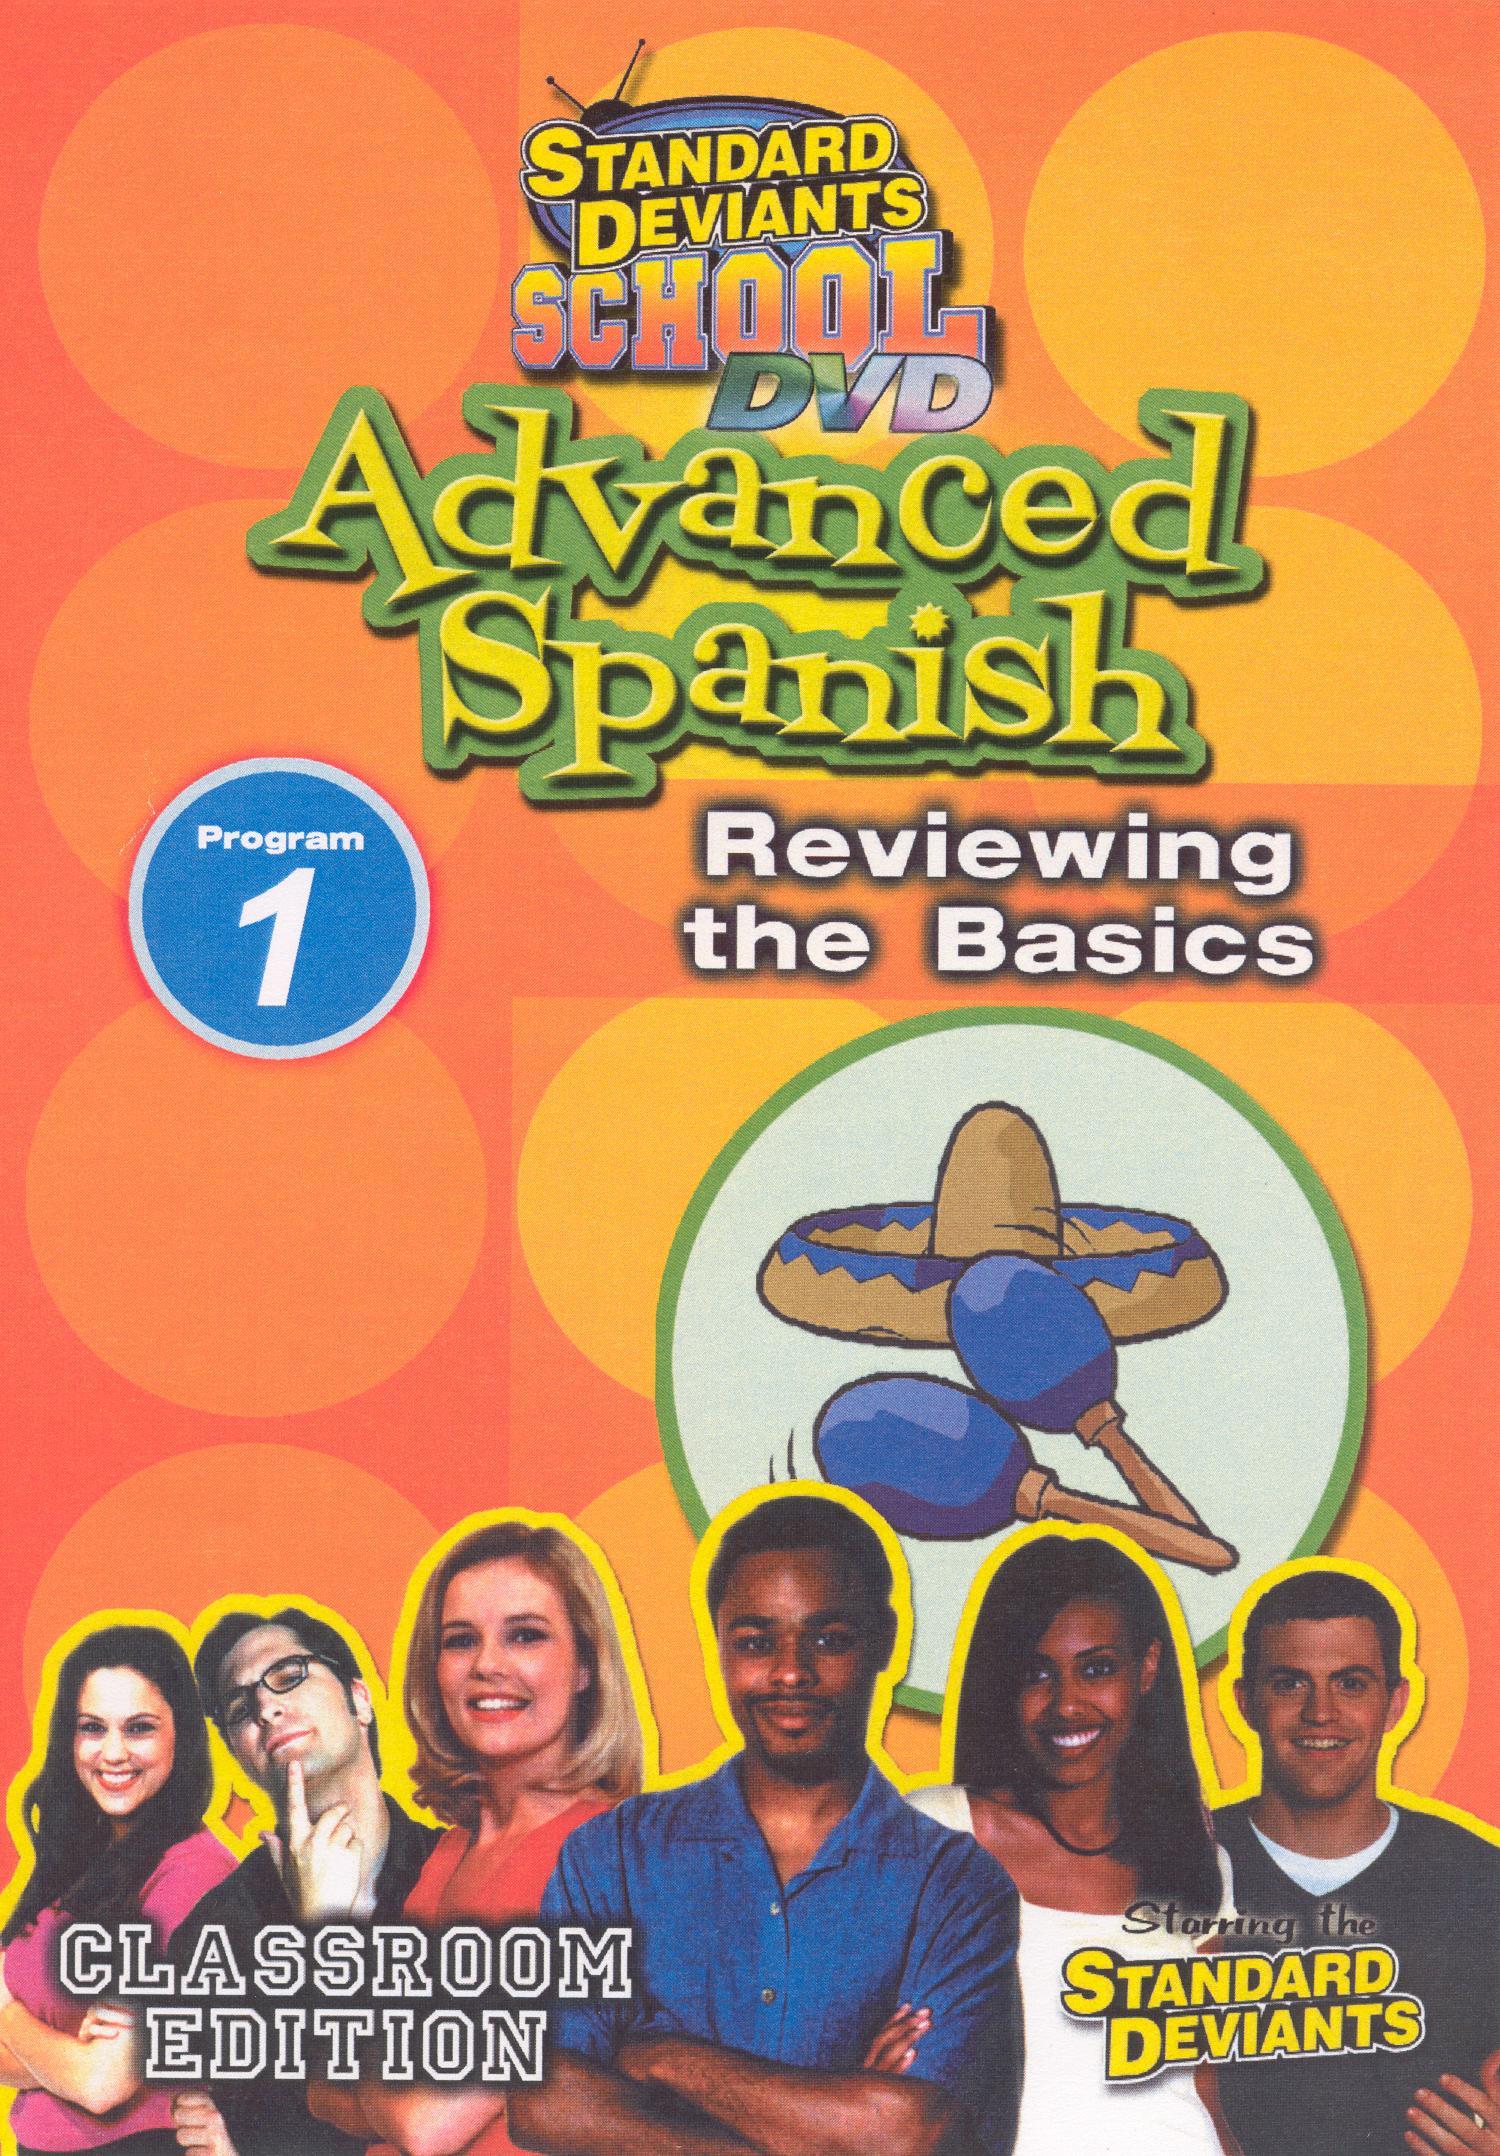 Standard Deviants School: Advanced Spanish, Program 1